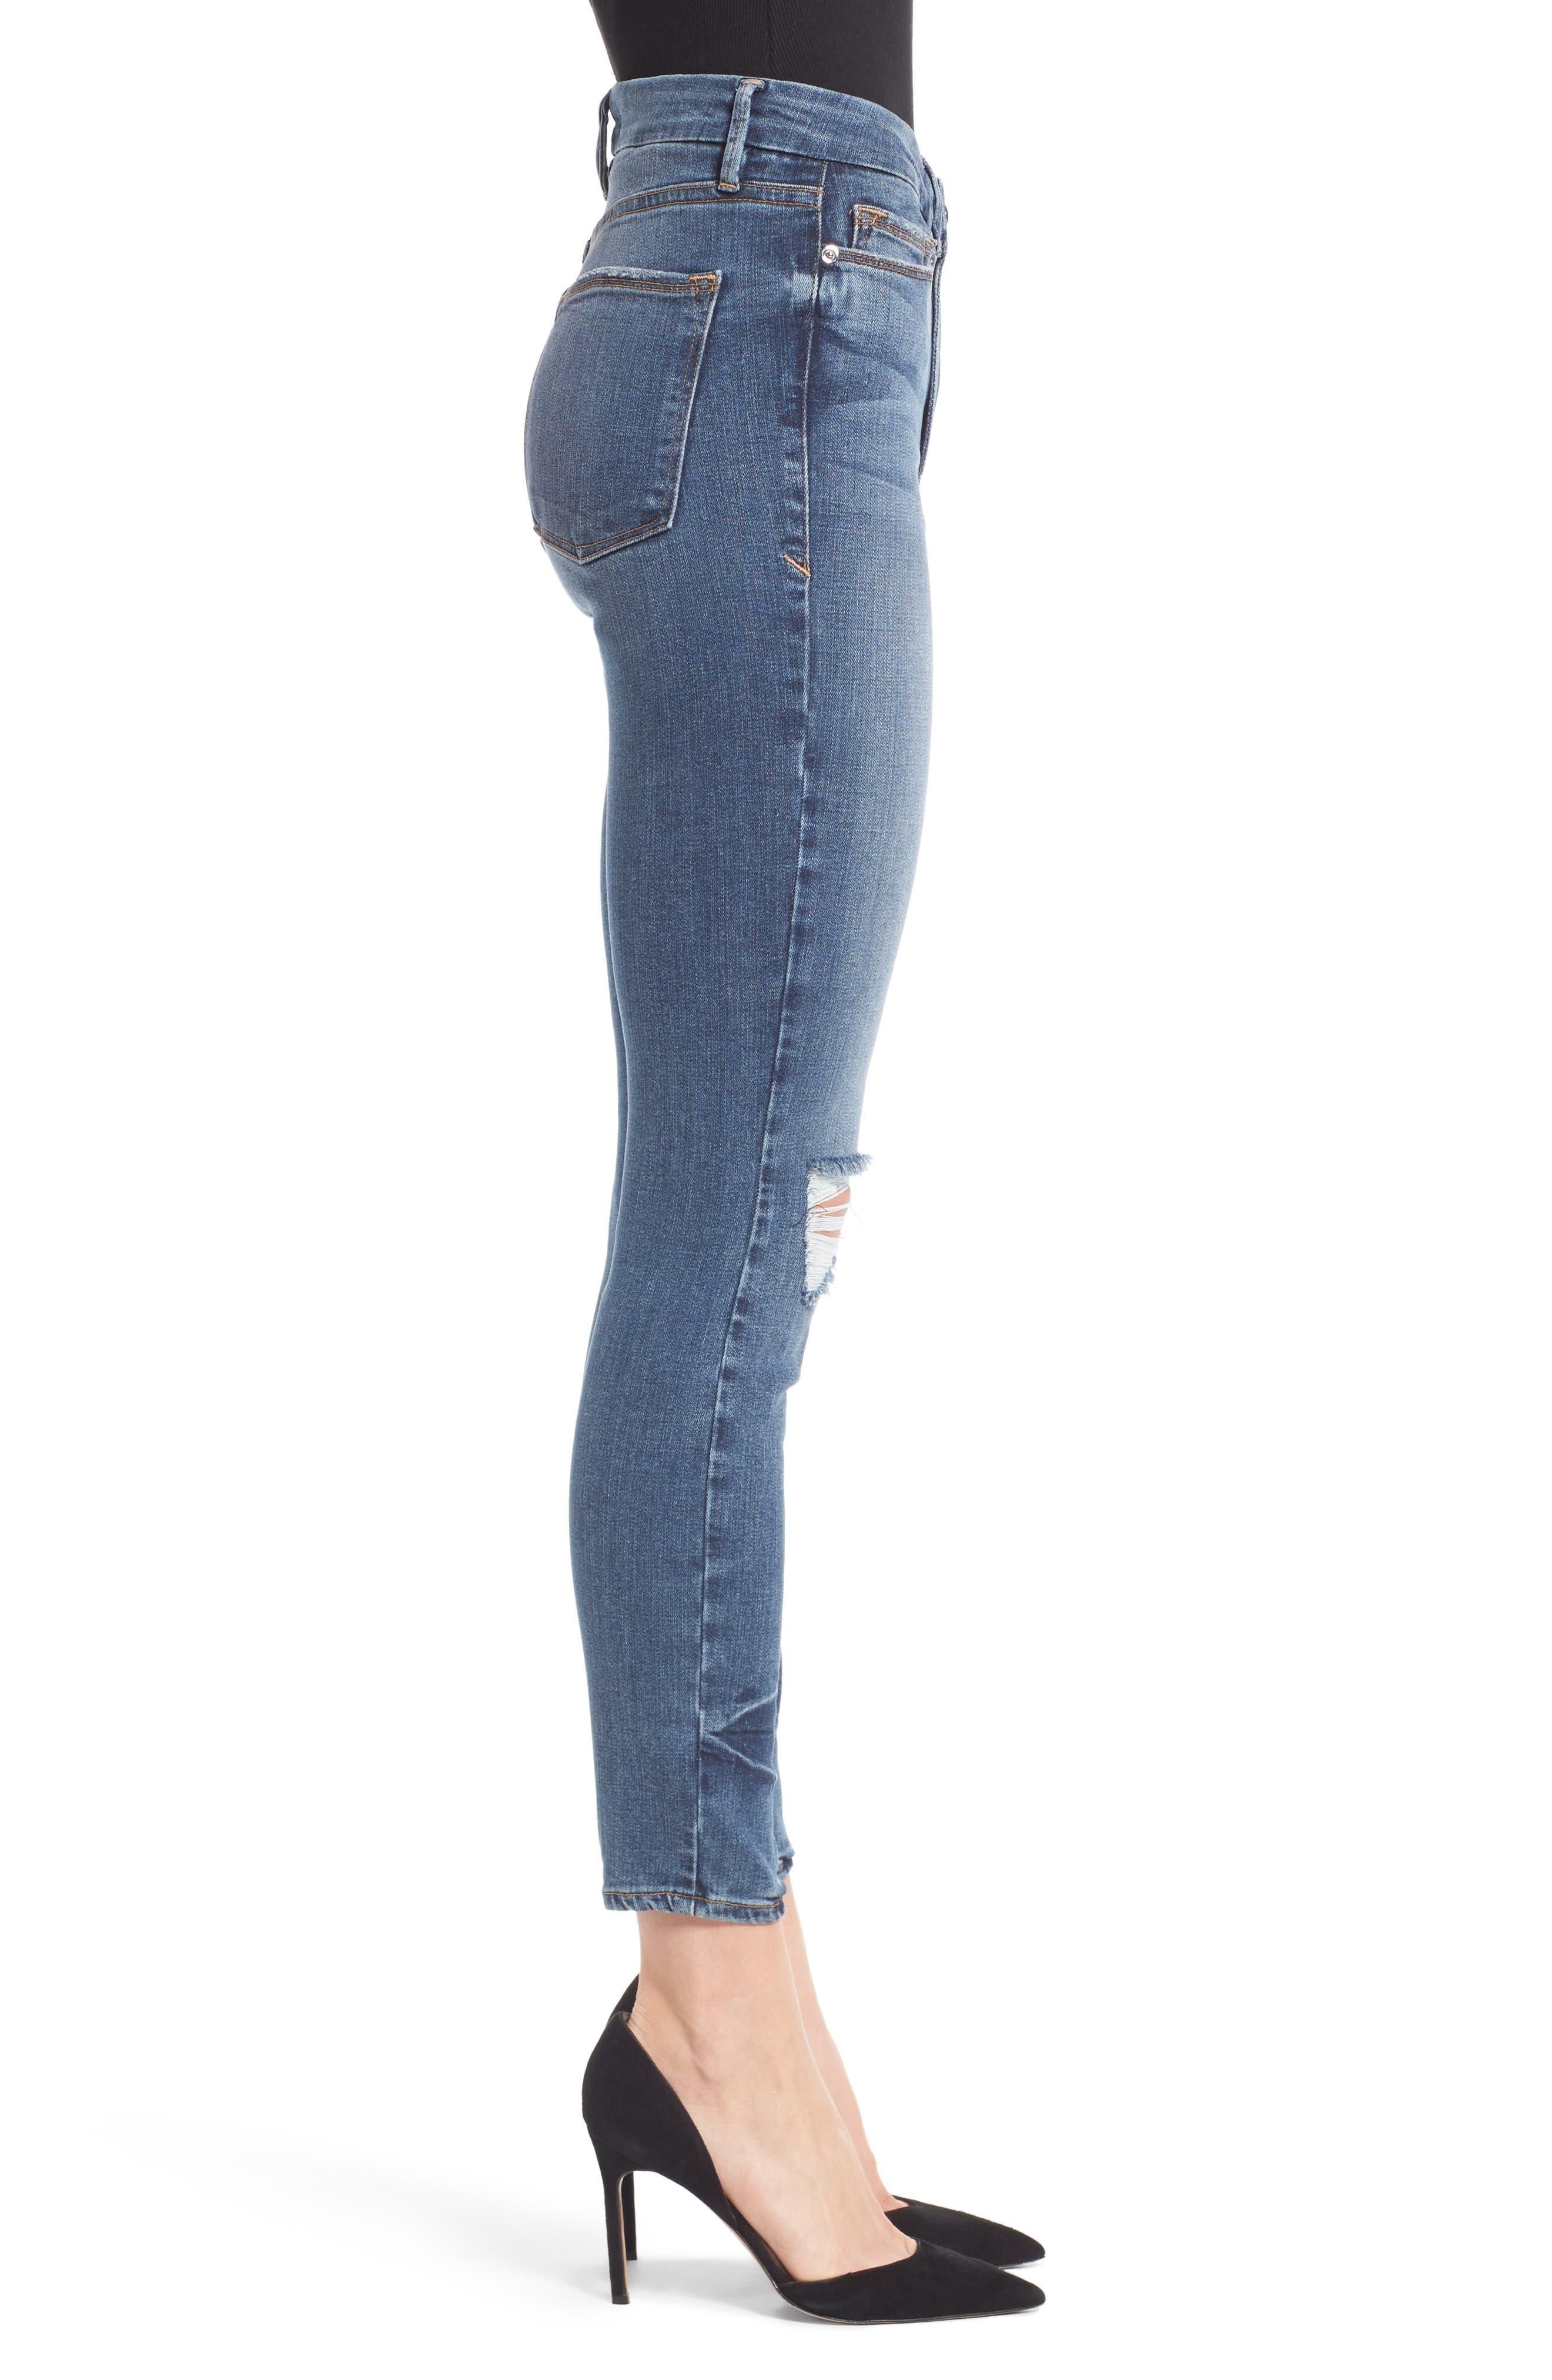 Alternate Image 3  - Good American Good Legs High Waist Ankle Skinny Jeans (Blue 084) (Regular & Plus Size)